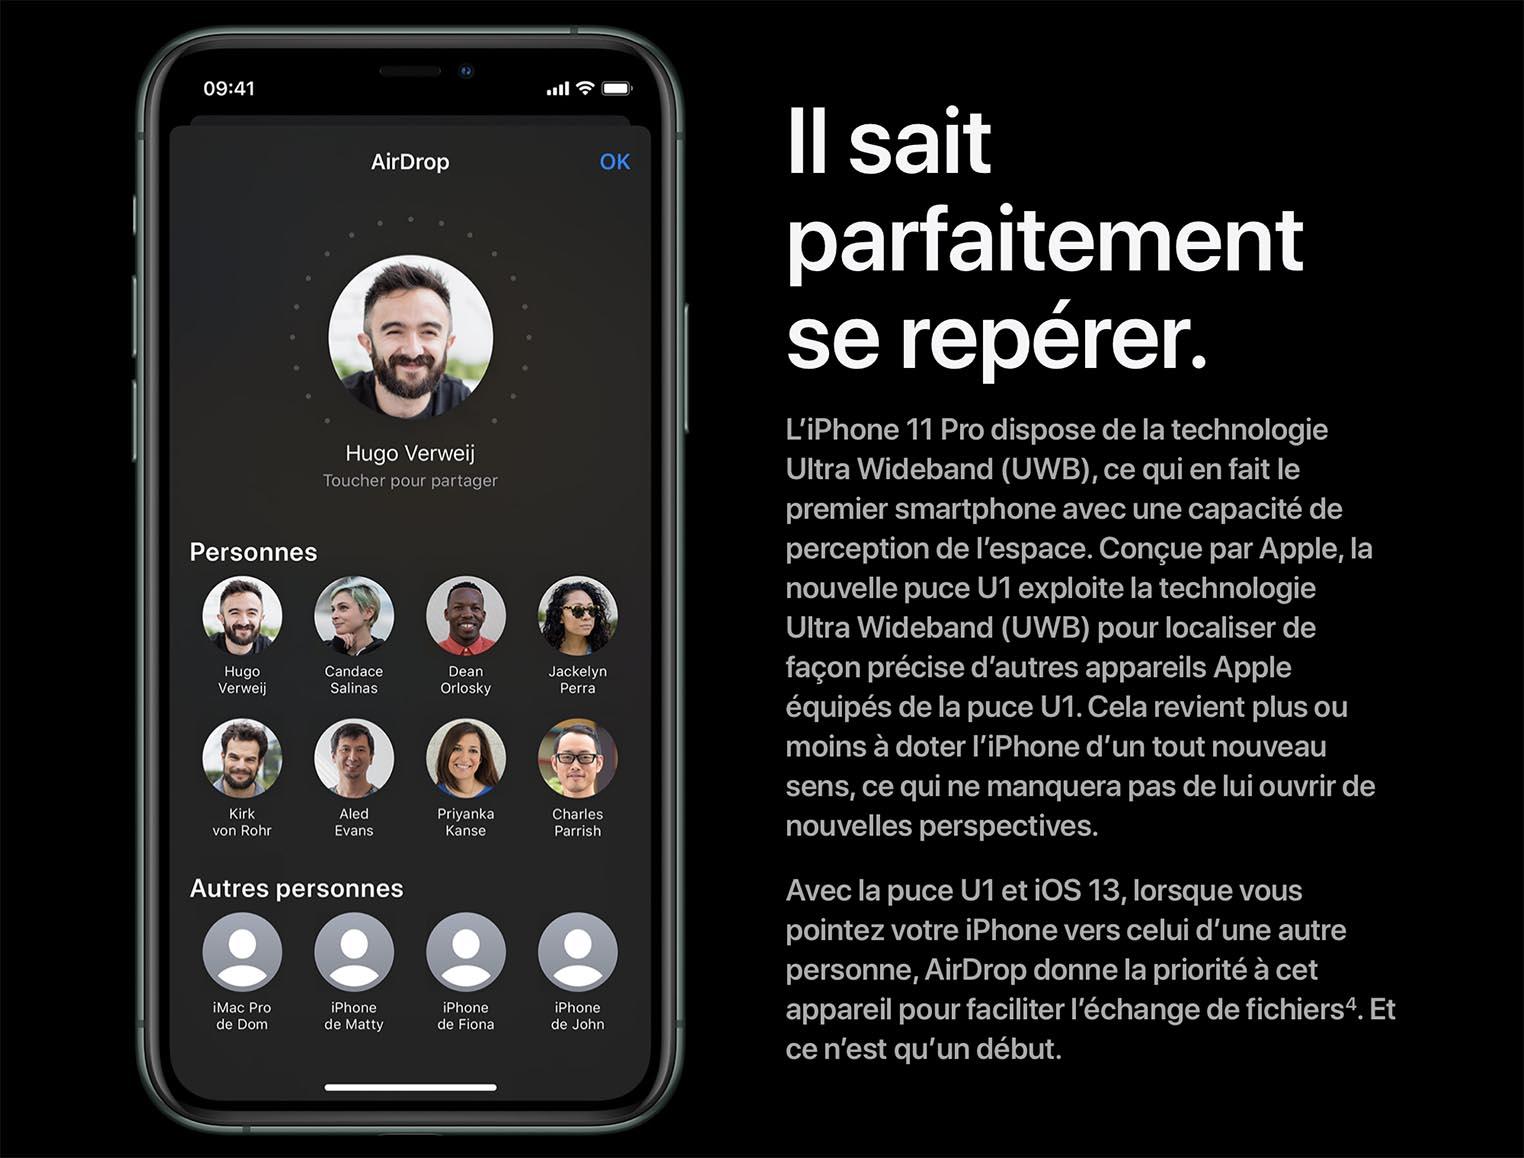 Apple U1 AirDrop